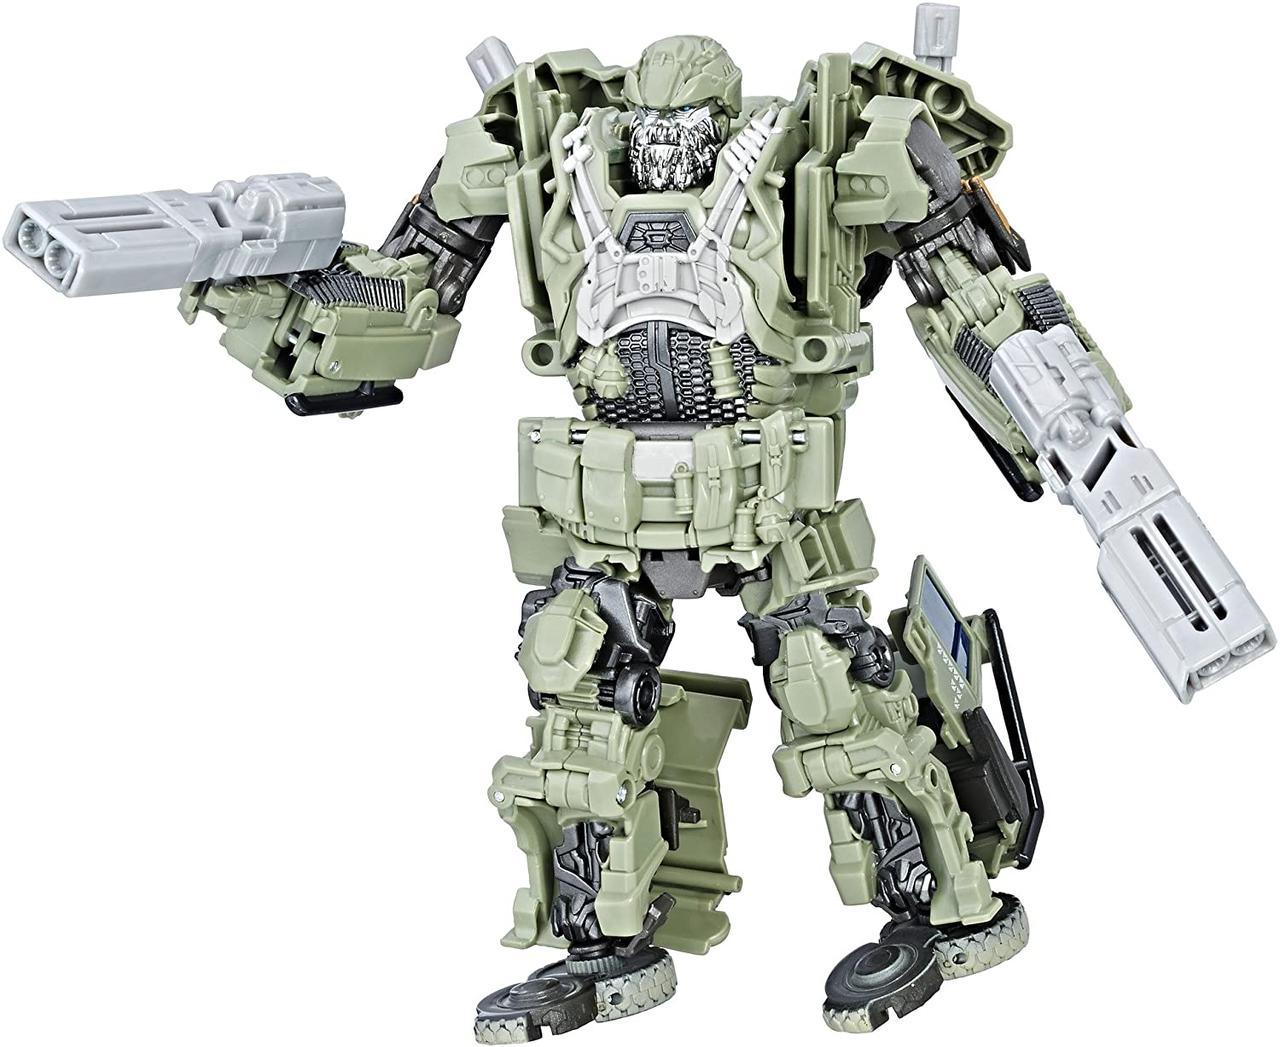 Трансформерс Последний рыцарь Автобот Хаунд -Transformers The Last Knight Voyager Class Autobot Hound